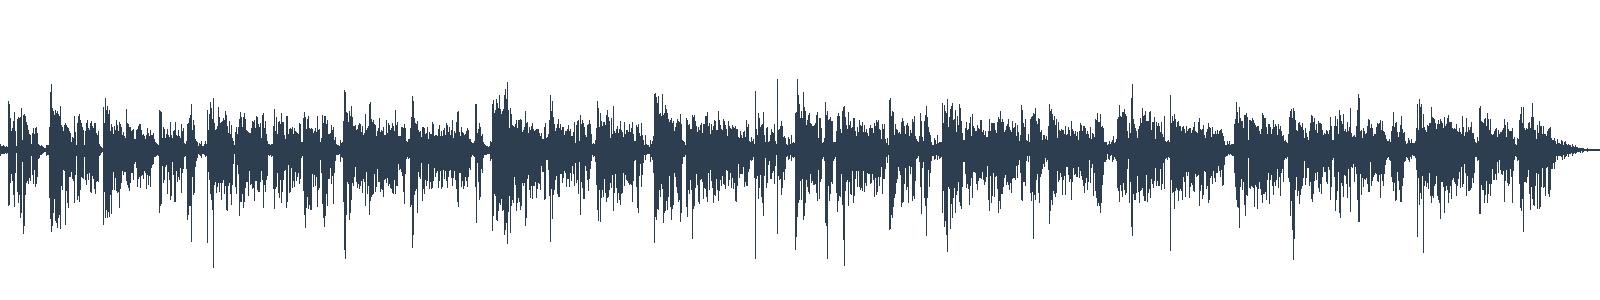 Nové audioknihy 17/2019 waveform